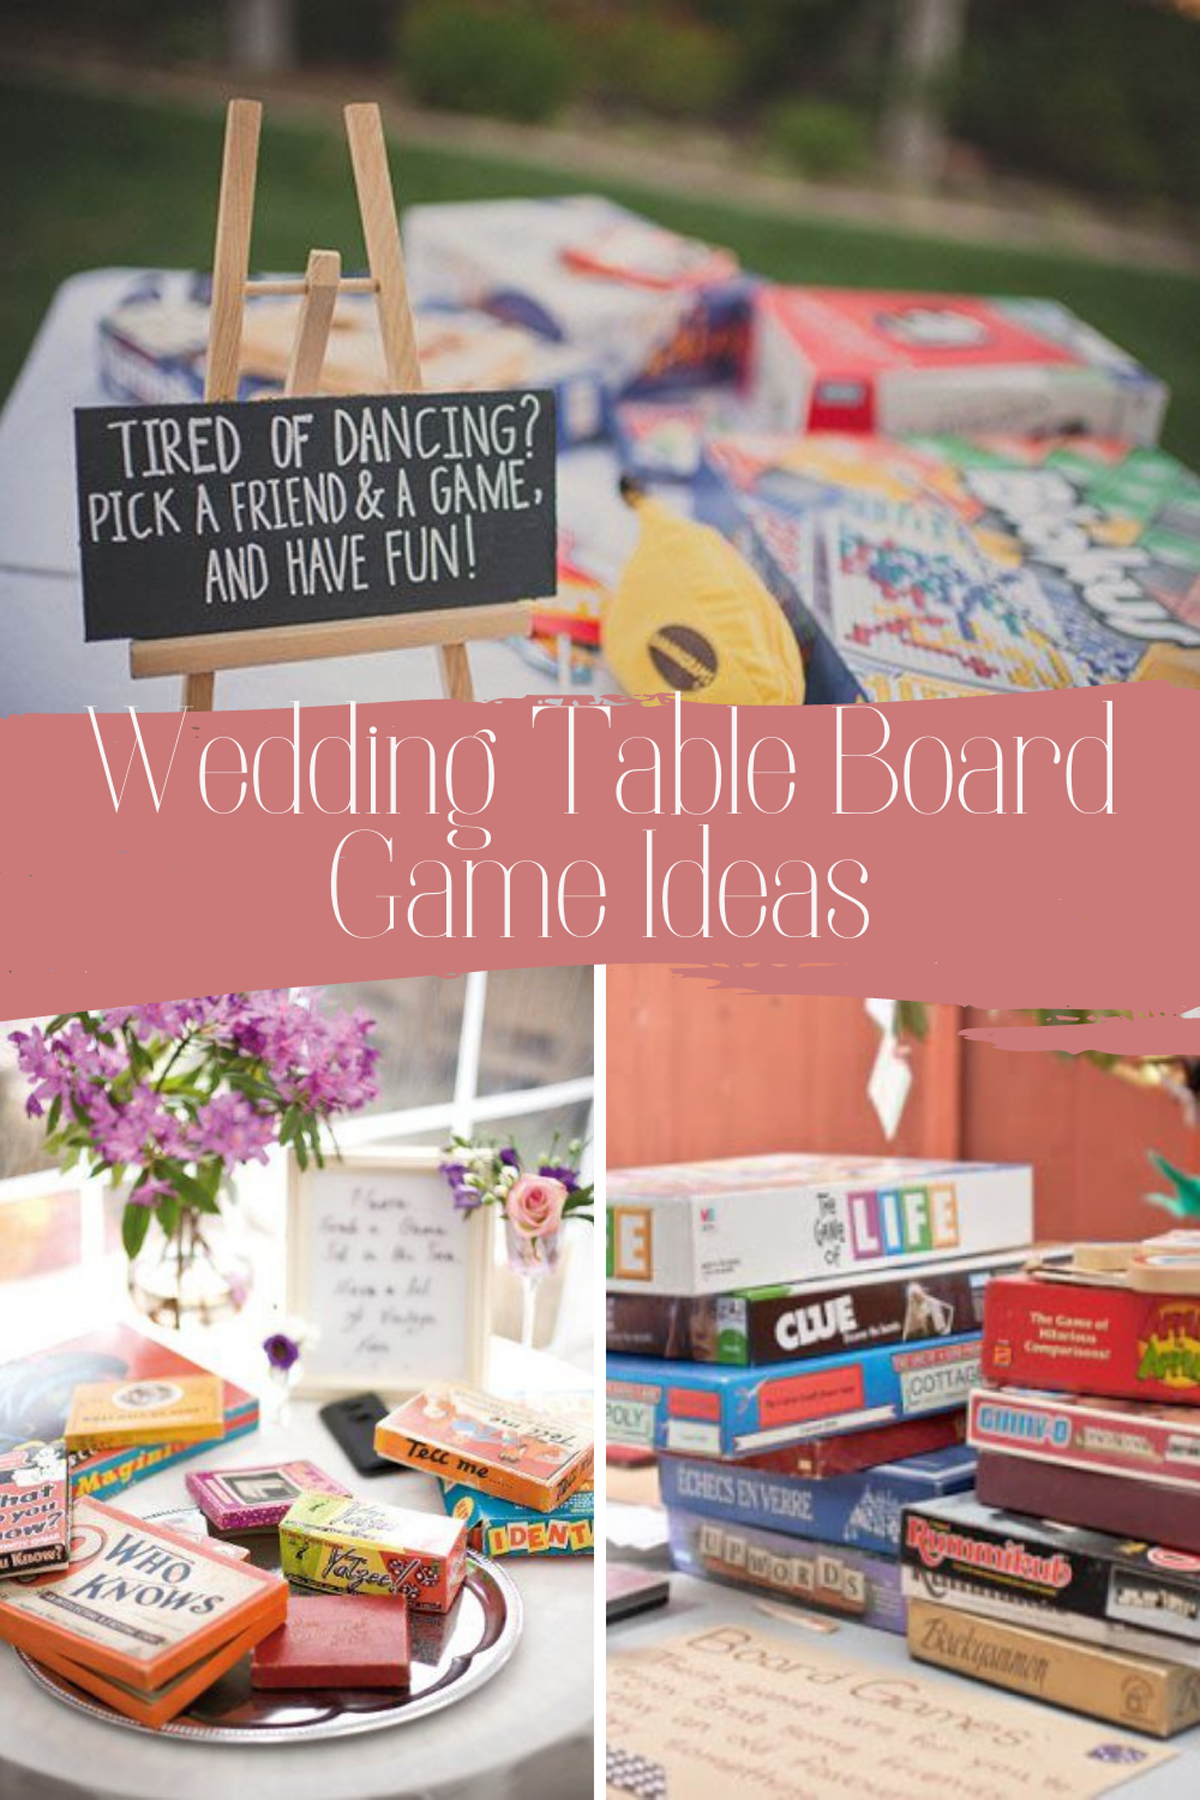 Wedding Table Board Game Ideas